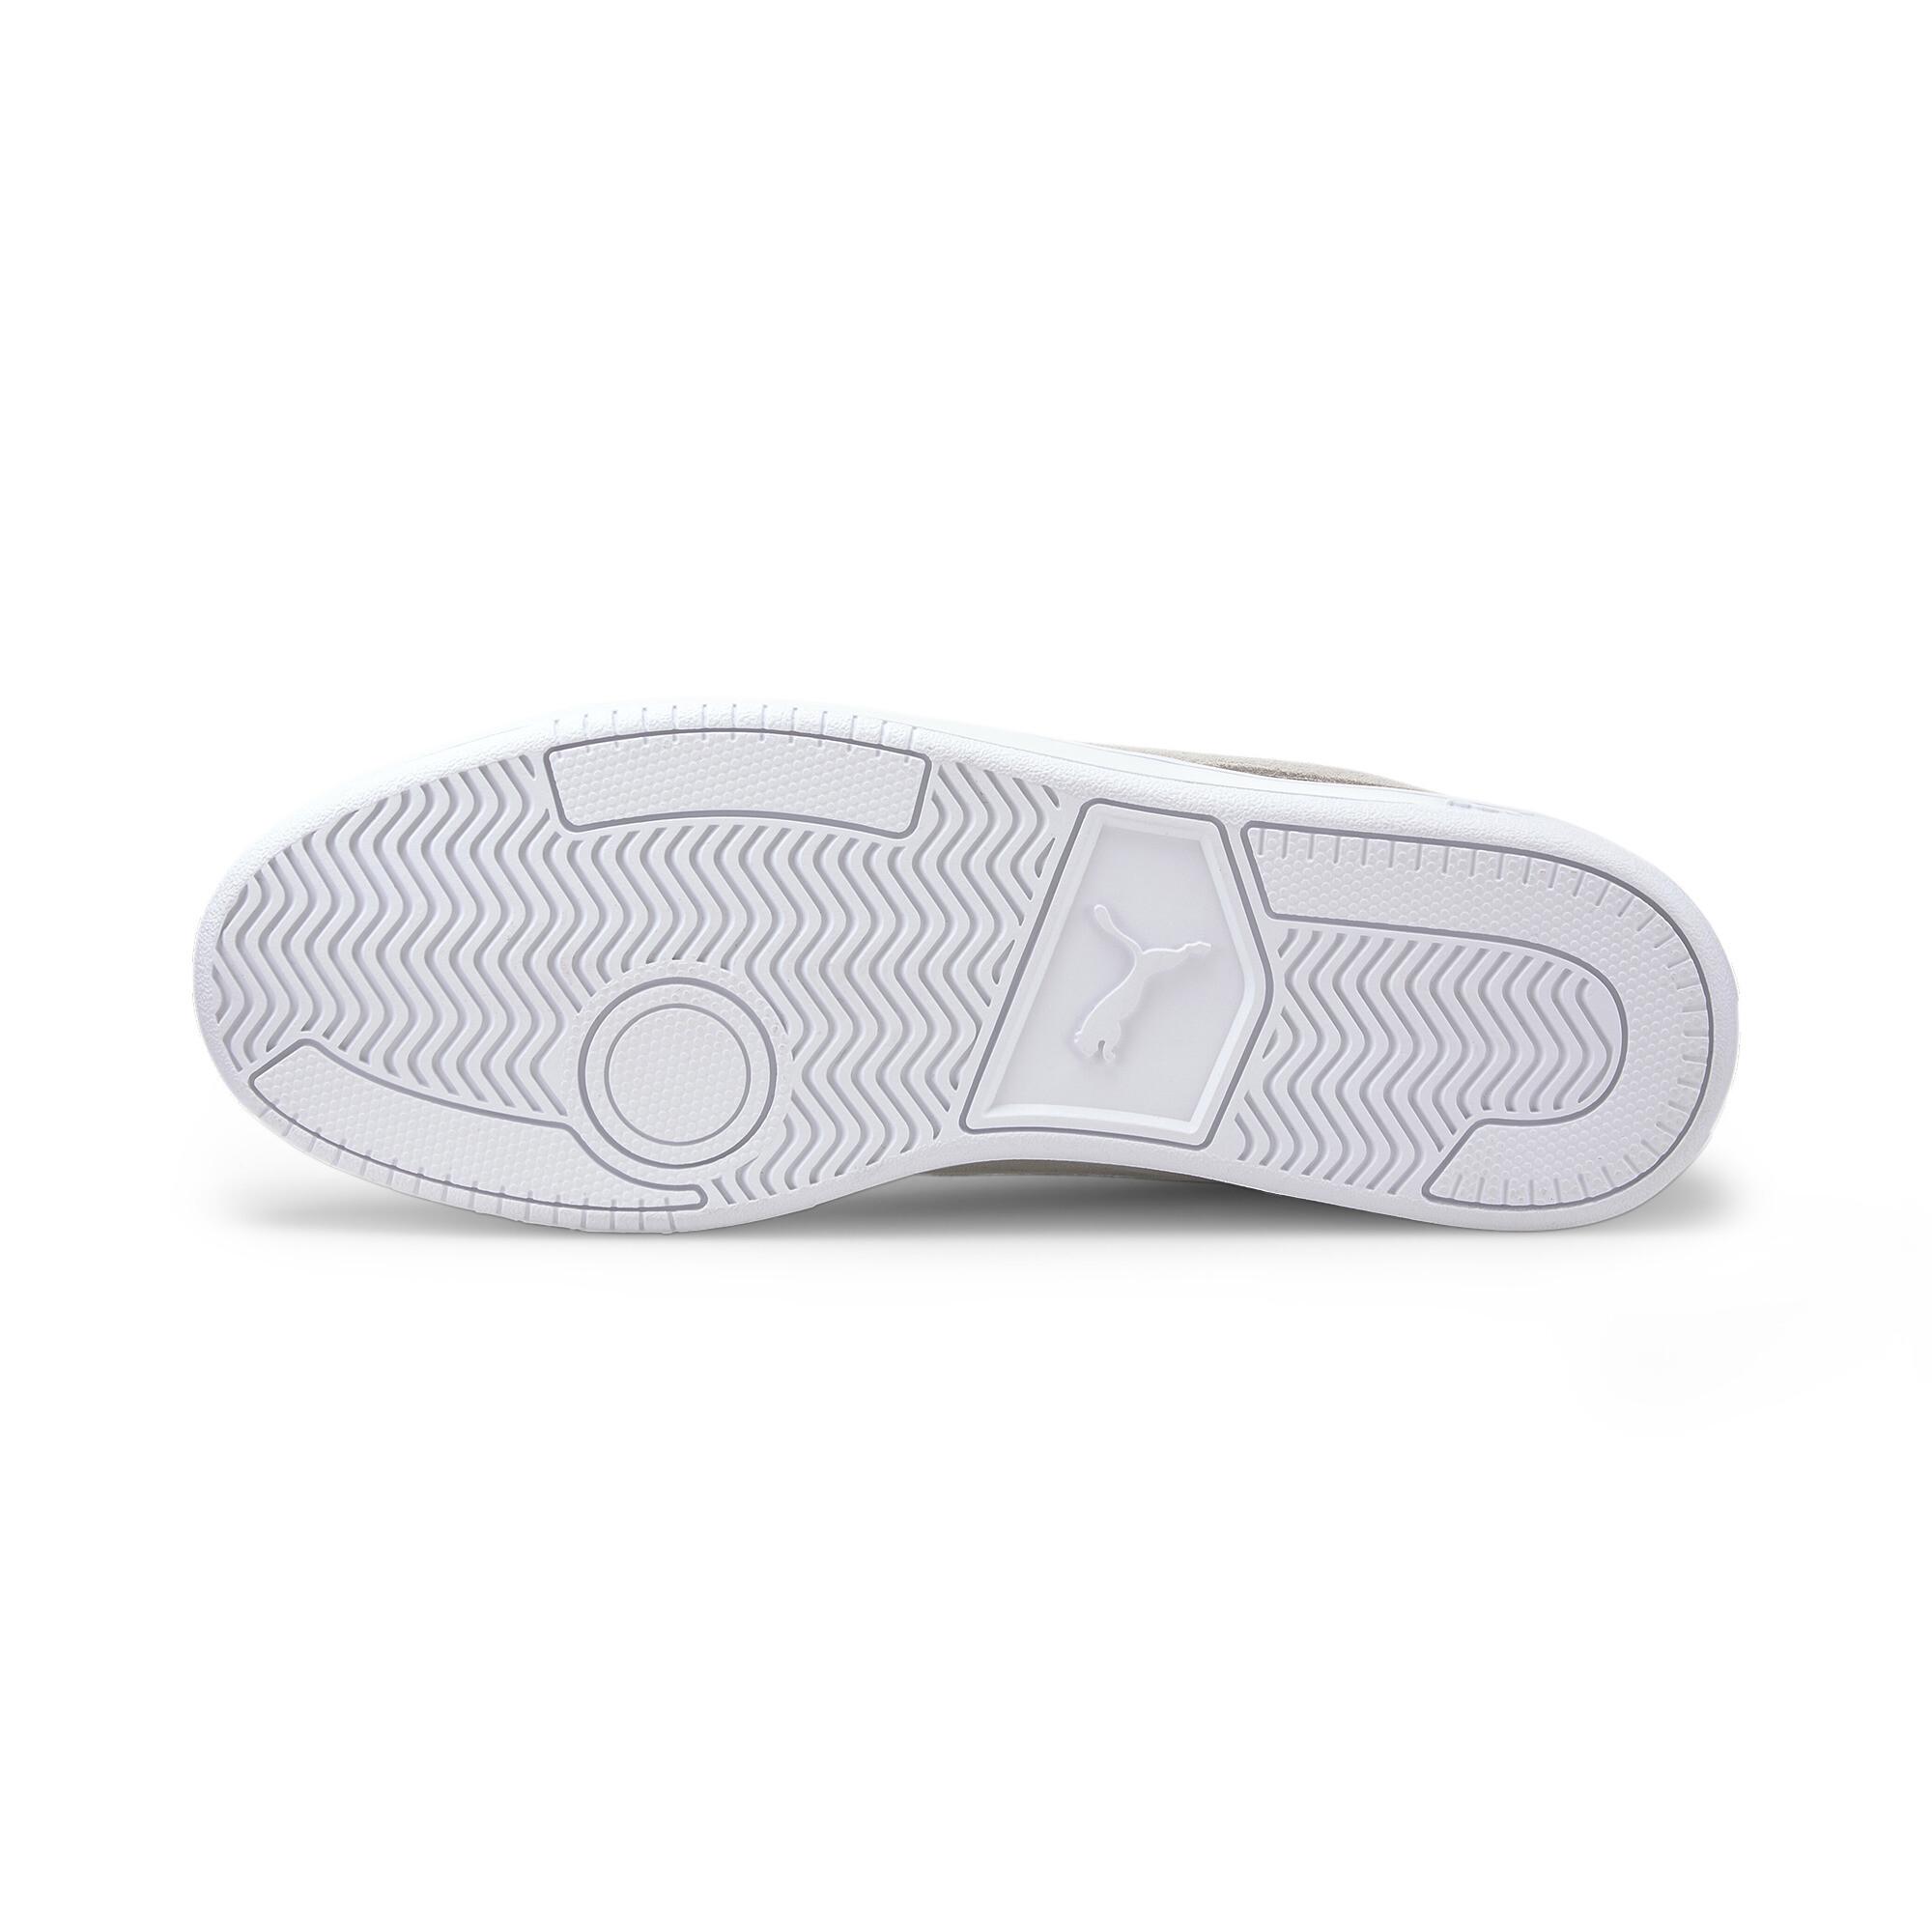 Indexbild 11 - PUMA Court Legend Lo Sneaker Unisex Schuhe Basics Neu